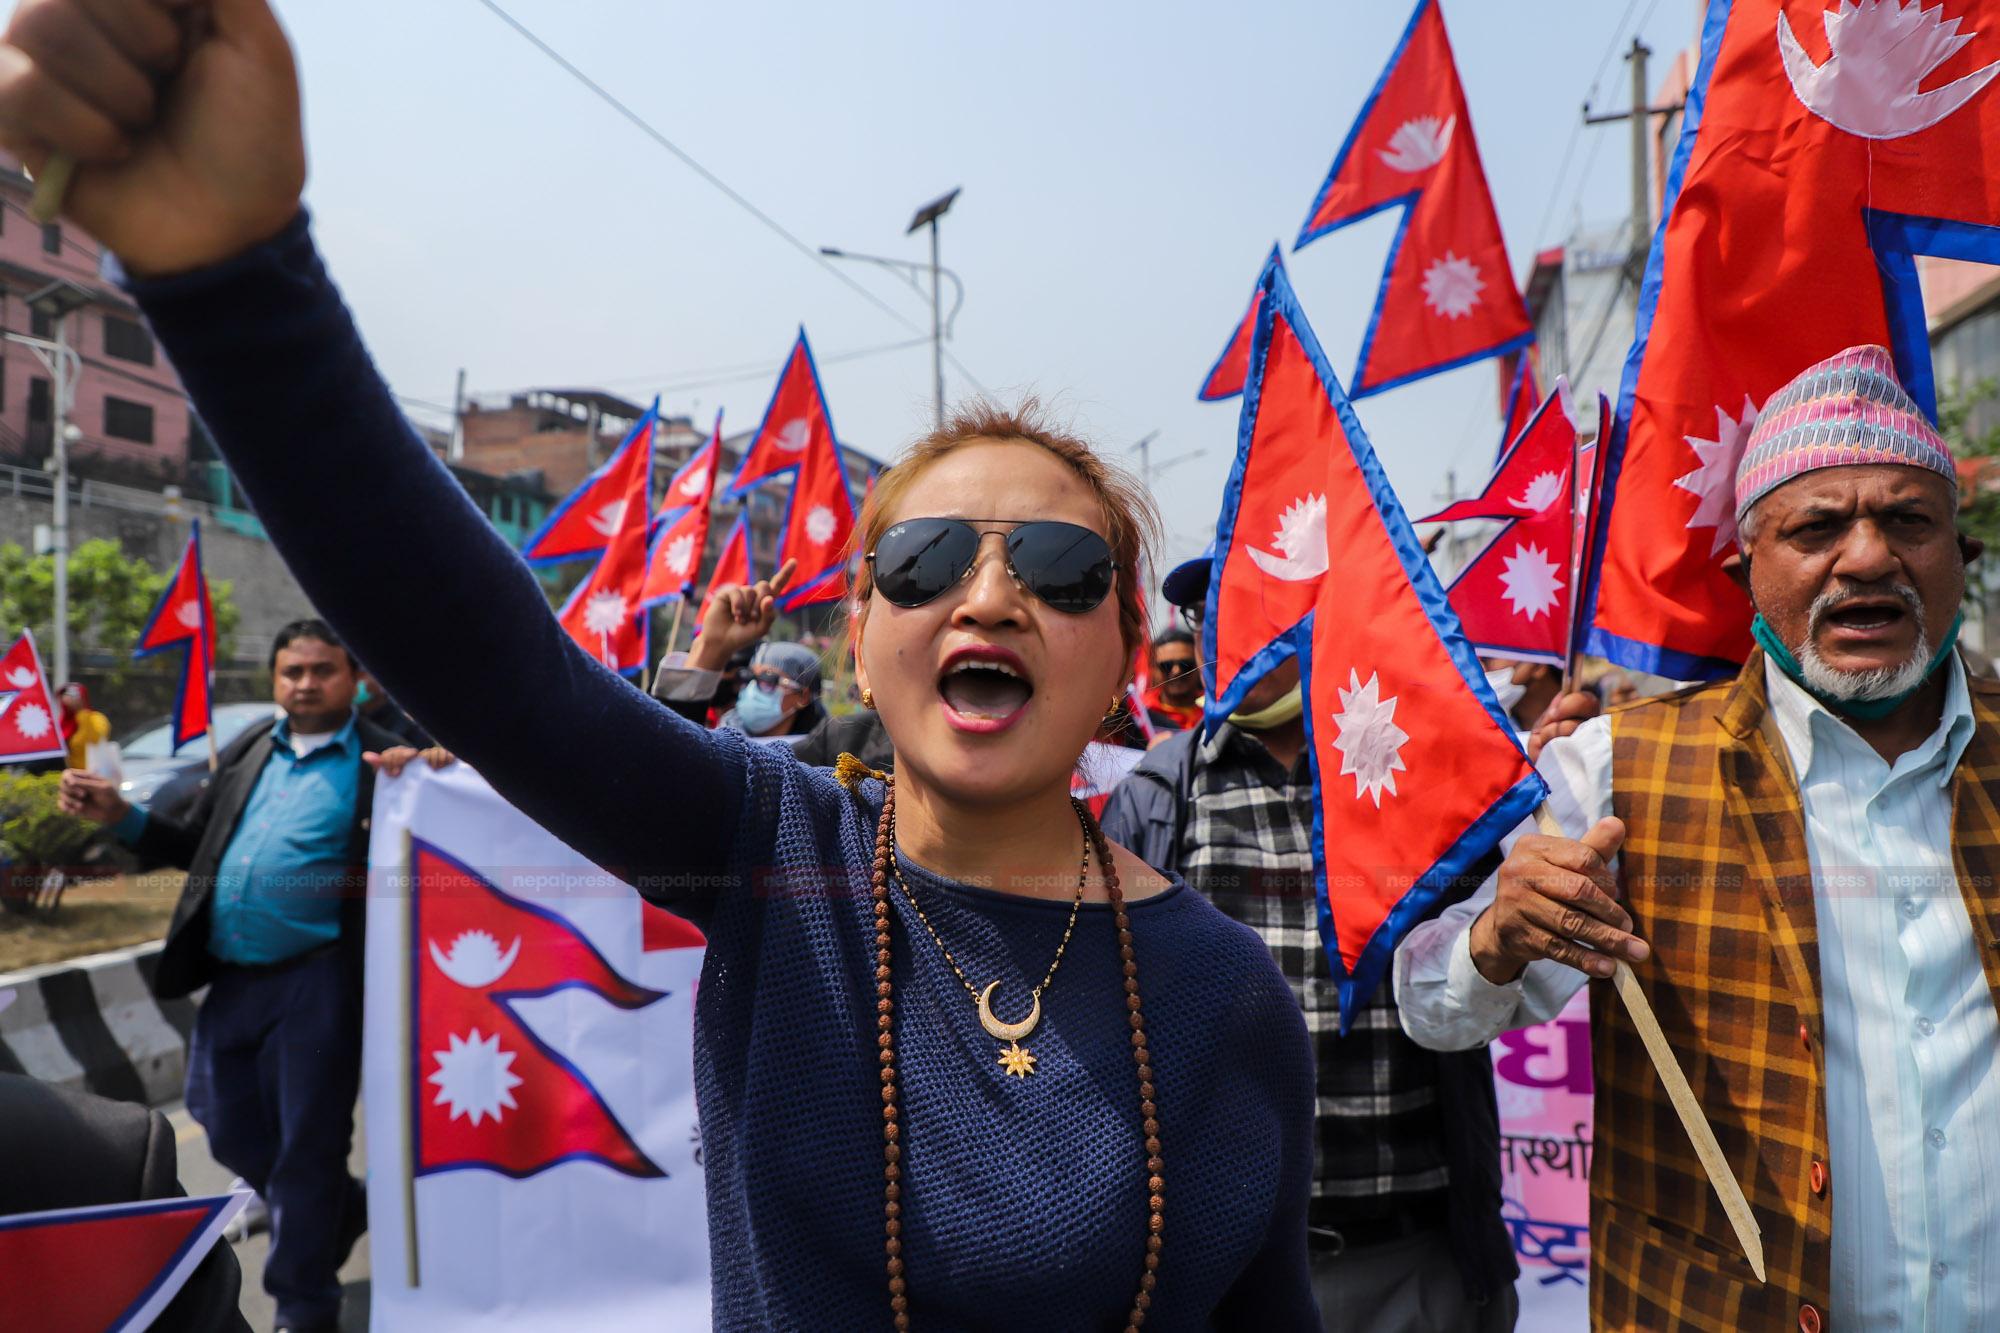 Demonstration demanding restoration of Hindu state and monarchy